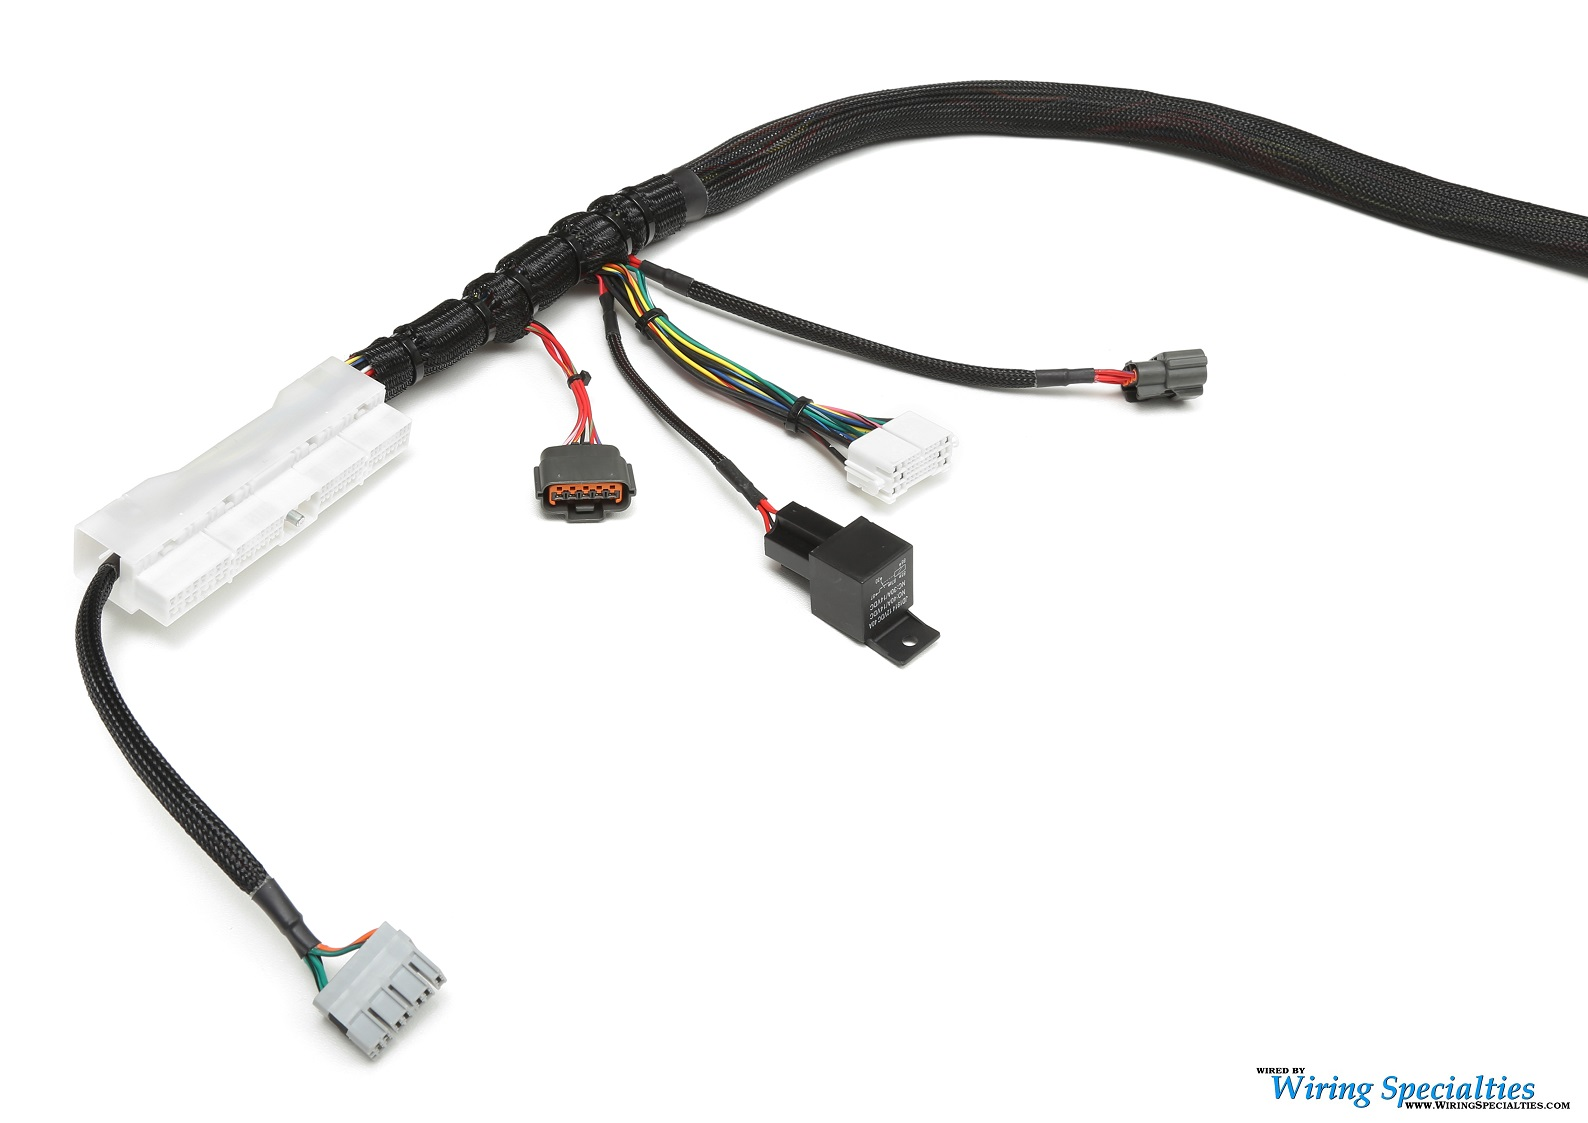 BMW E36 SR20DET Swap Wiring Harness | Wiring Specialties | Tt Auto Wiring Harness Connectors 1311 |  | Wiring Specialties